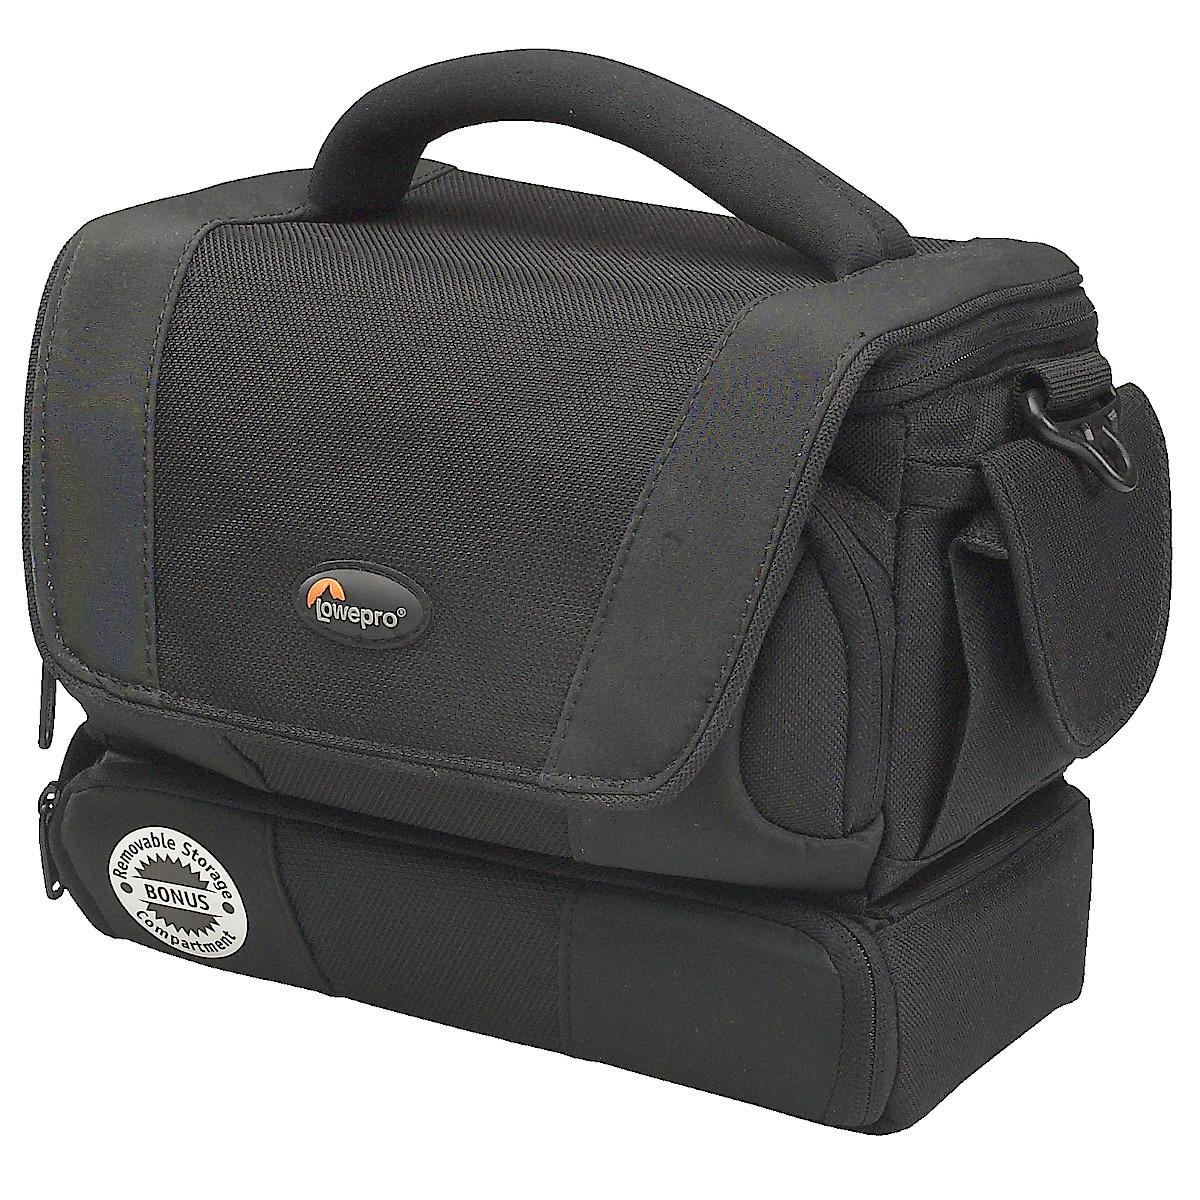 Lowepro Camcorder Bag